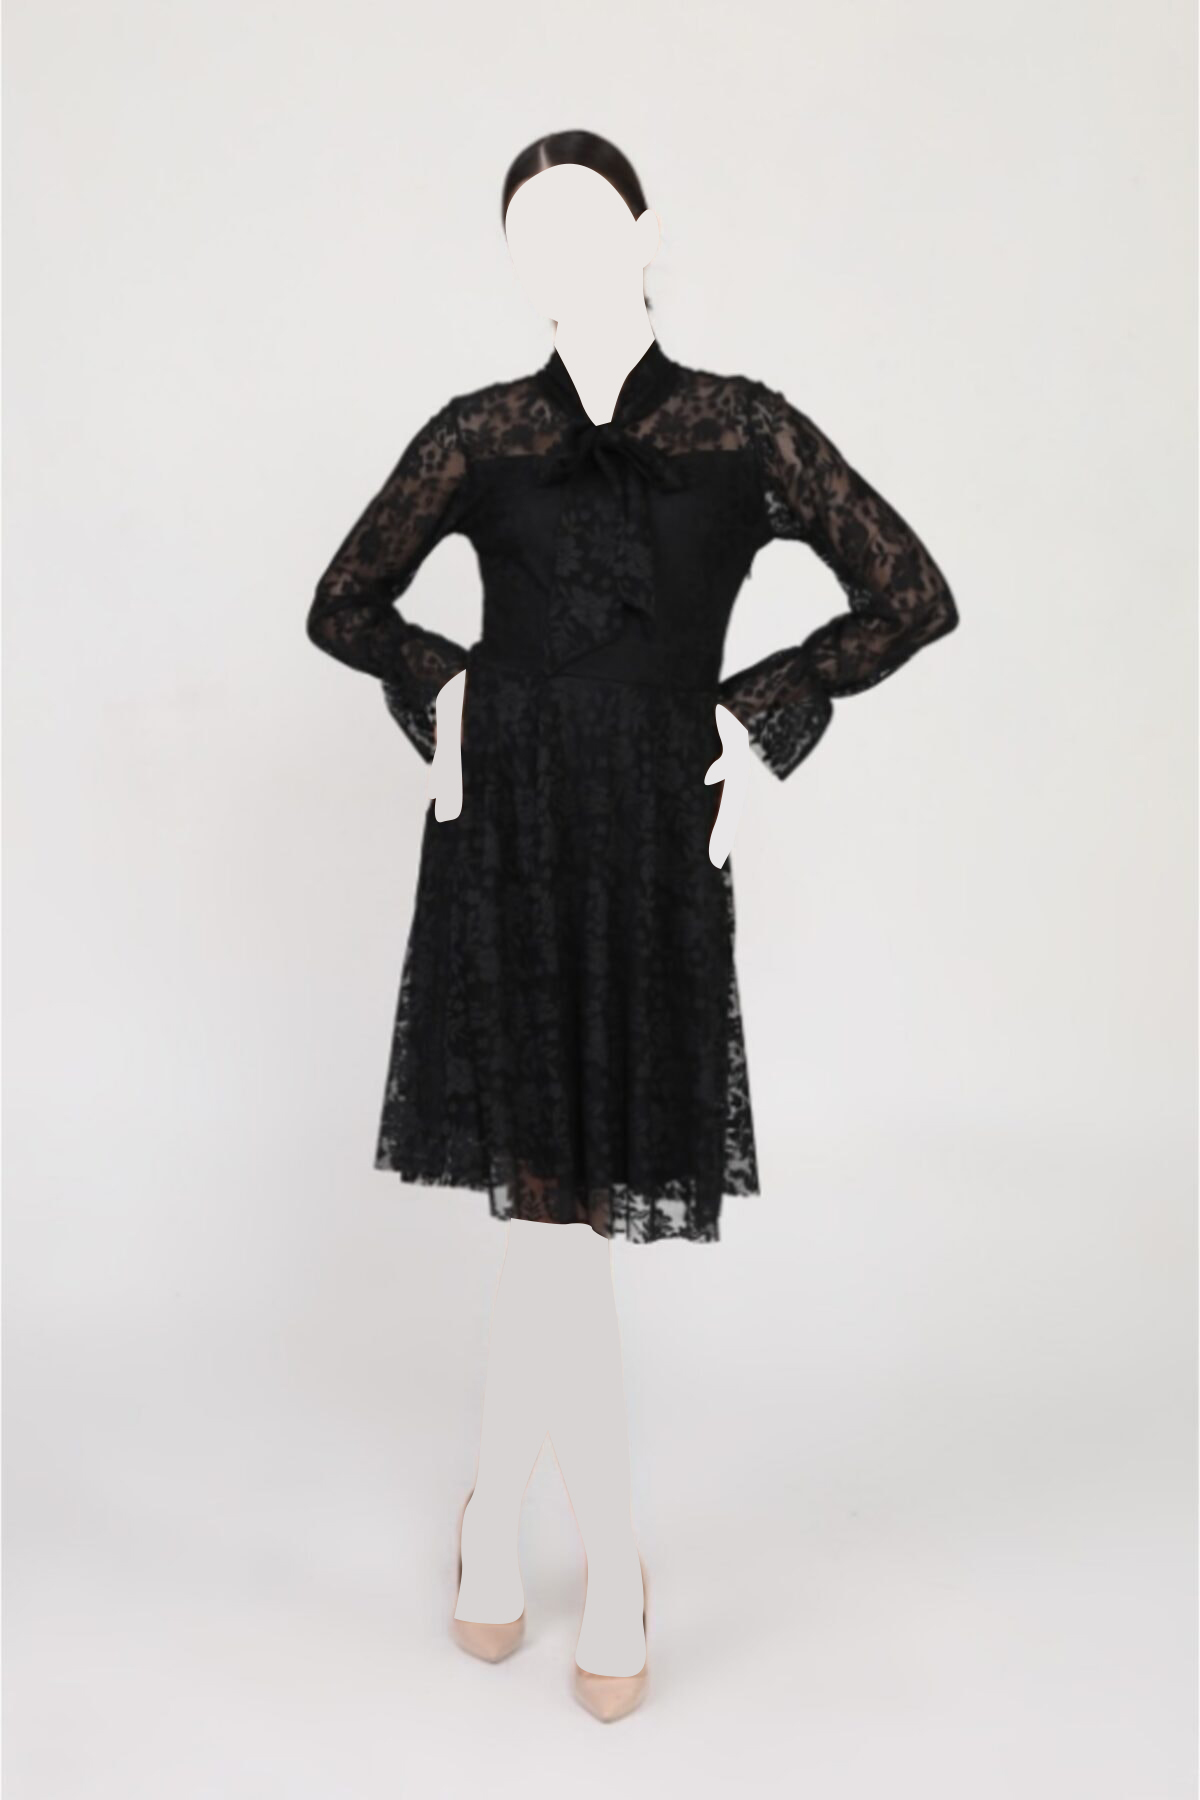 لباس مجلسی زنانه پارچه نخی برند Zenlife رنگ مشکی کد ty94185040